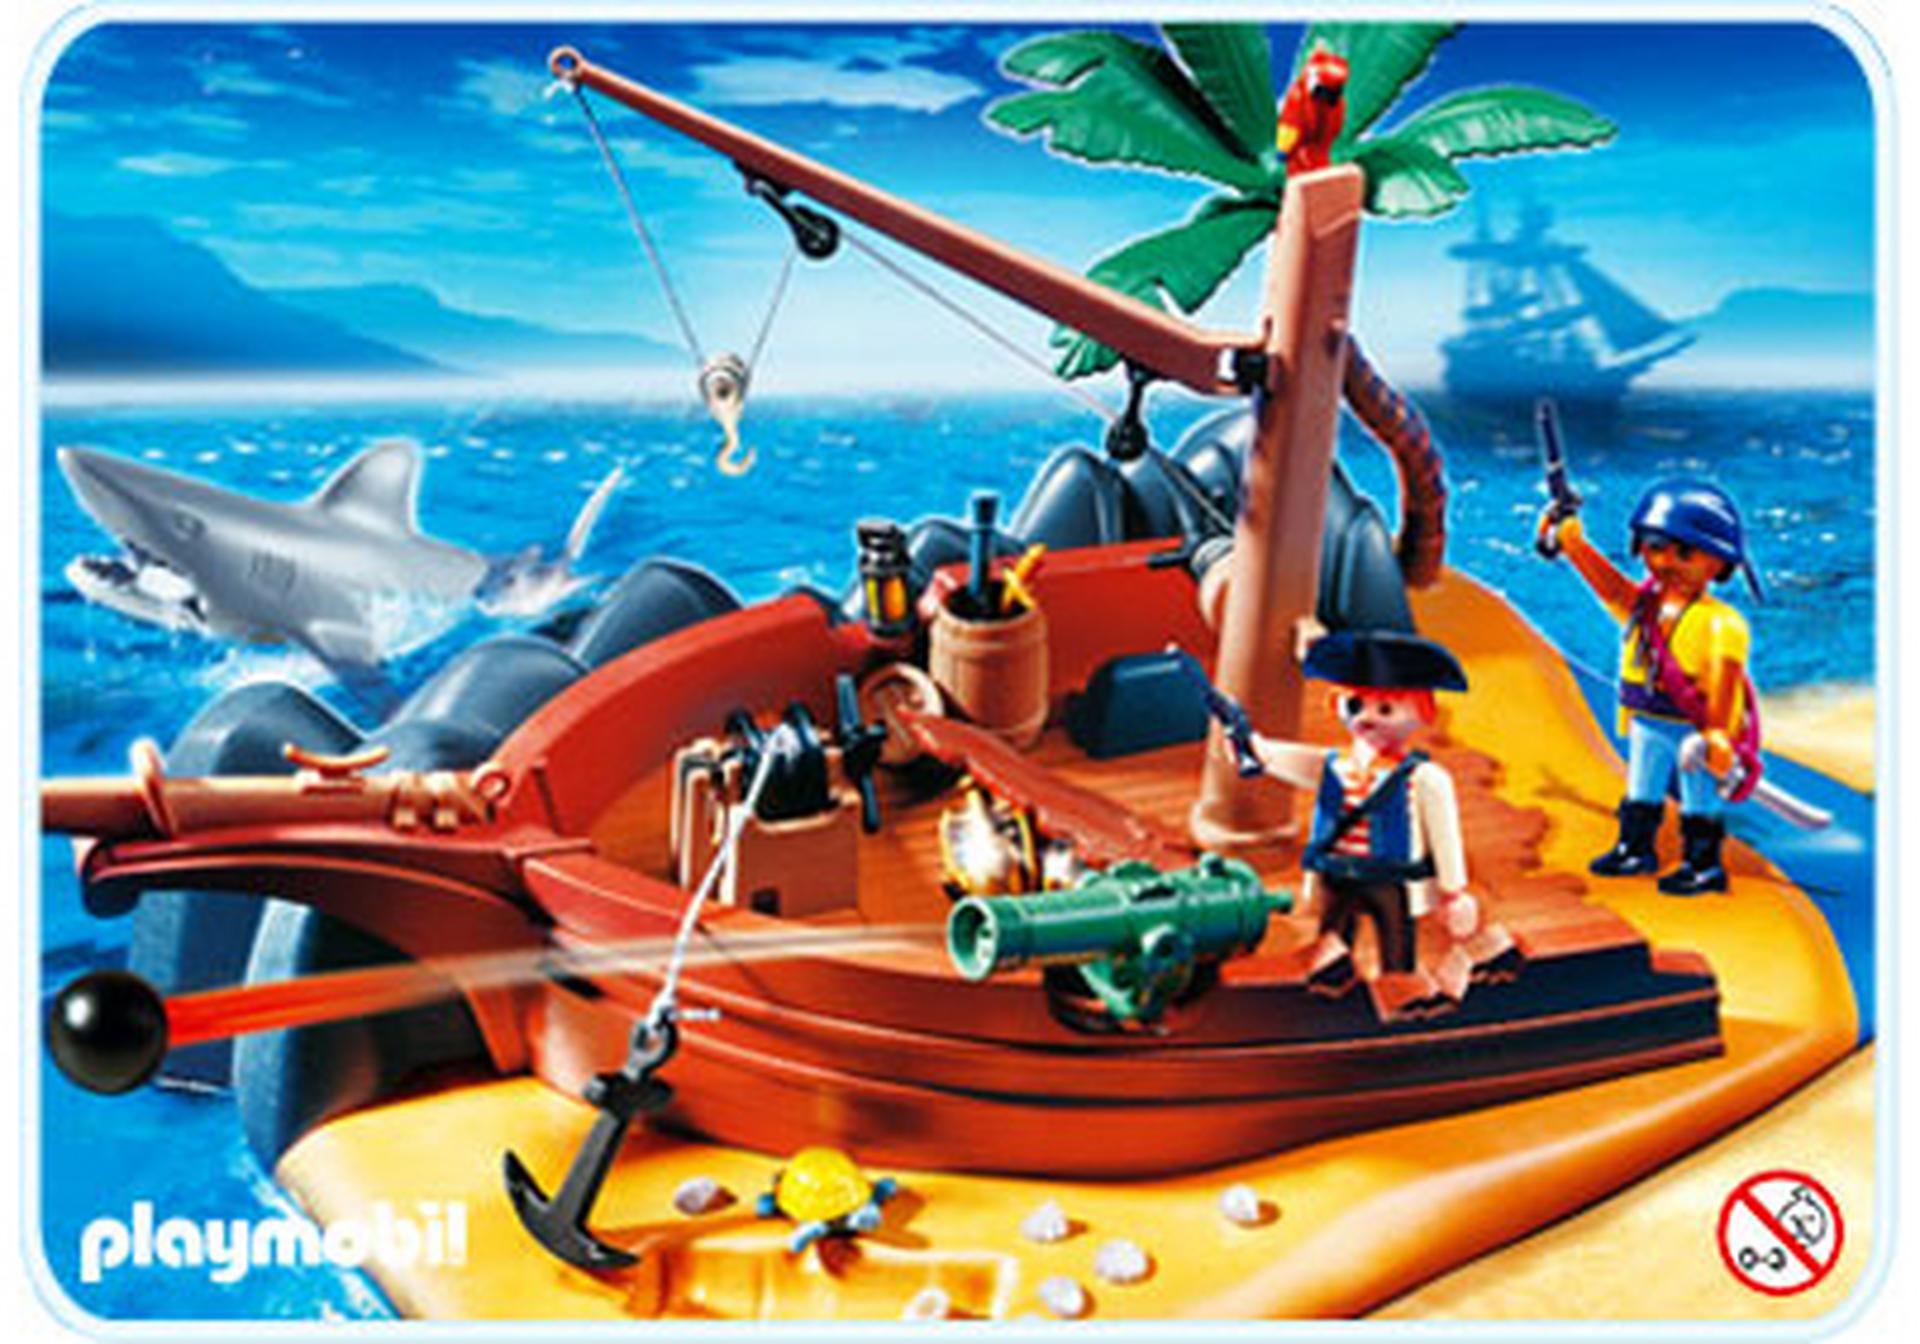 superset ile des pirates 4136 a playmobil france. Black Bedroom Furniture Sets. Home Design Ideas